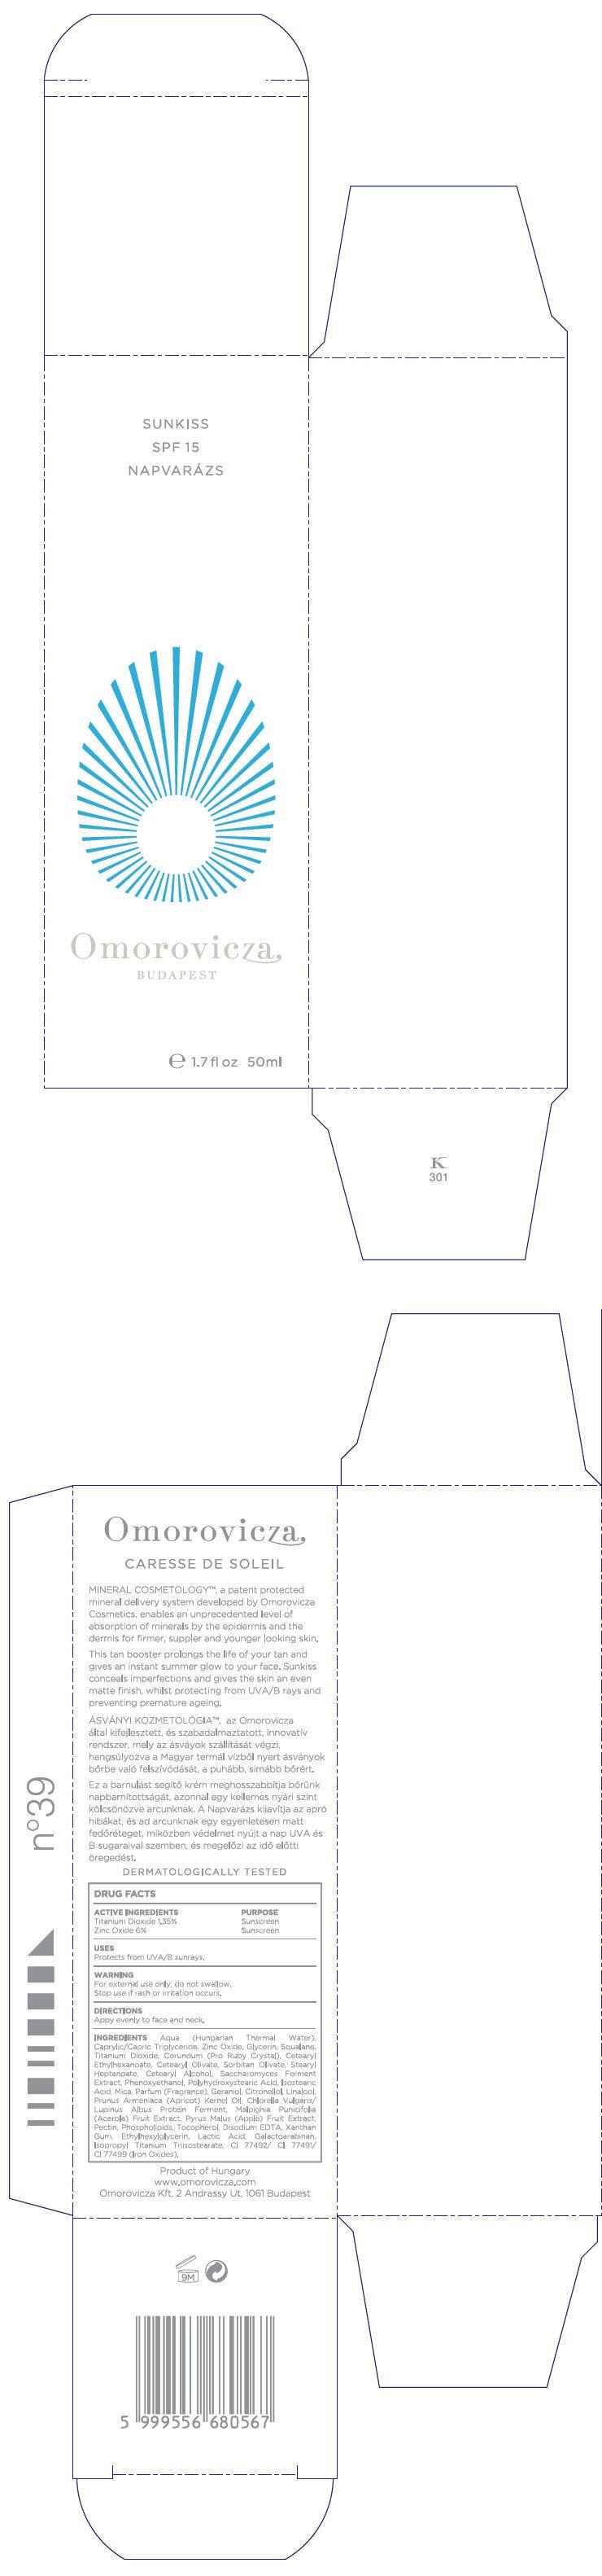 Sunkiss (Titanium Dioxide And Zinc Oxide) Cream [Omorovicza Kozmetikai Kft]